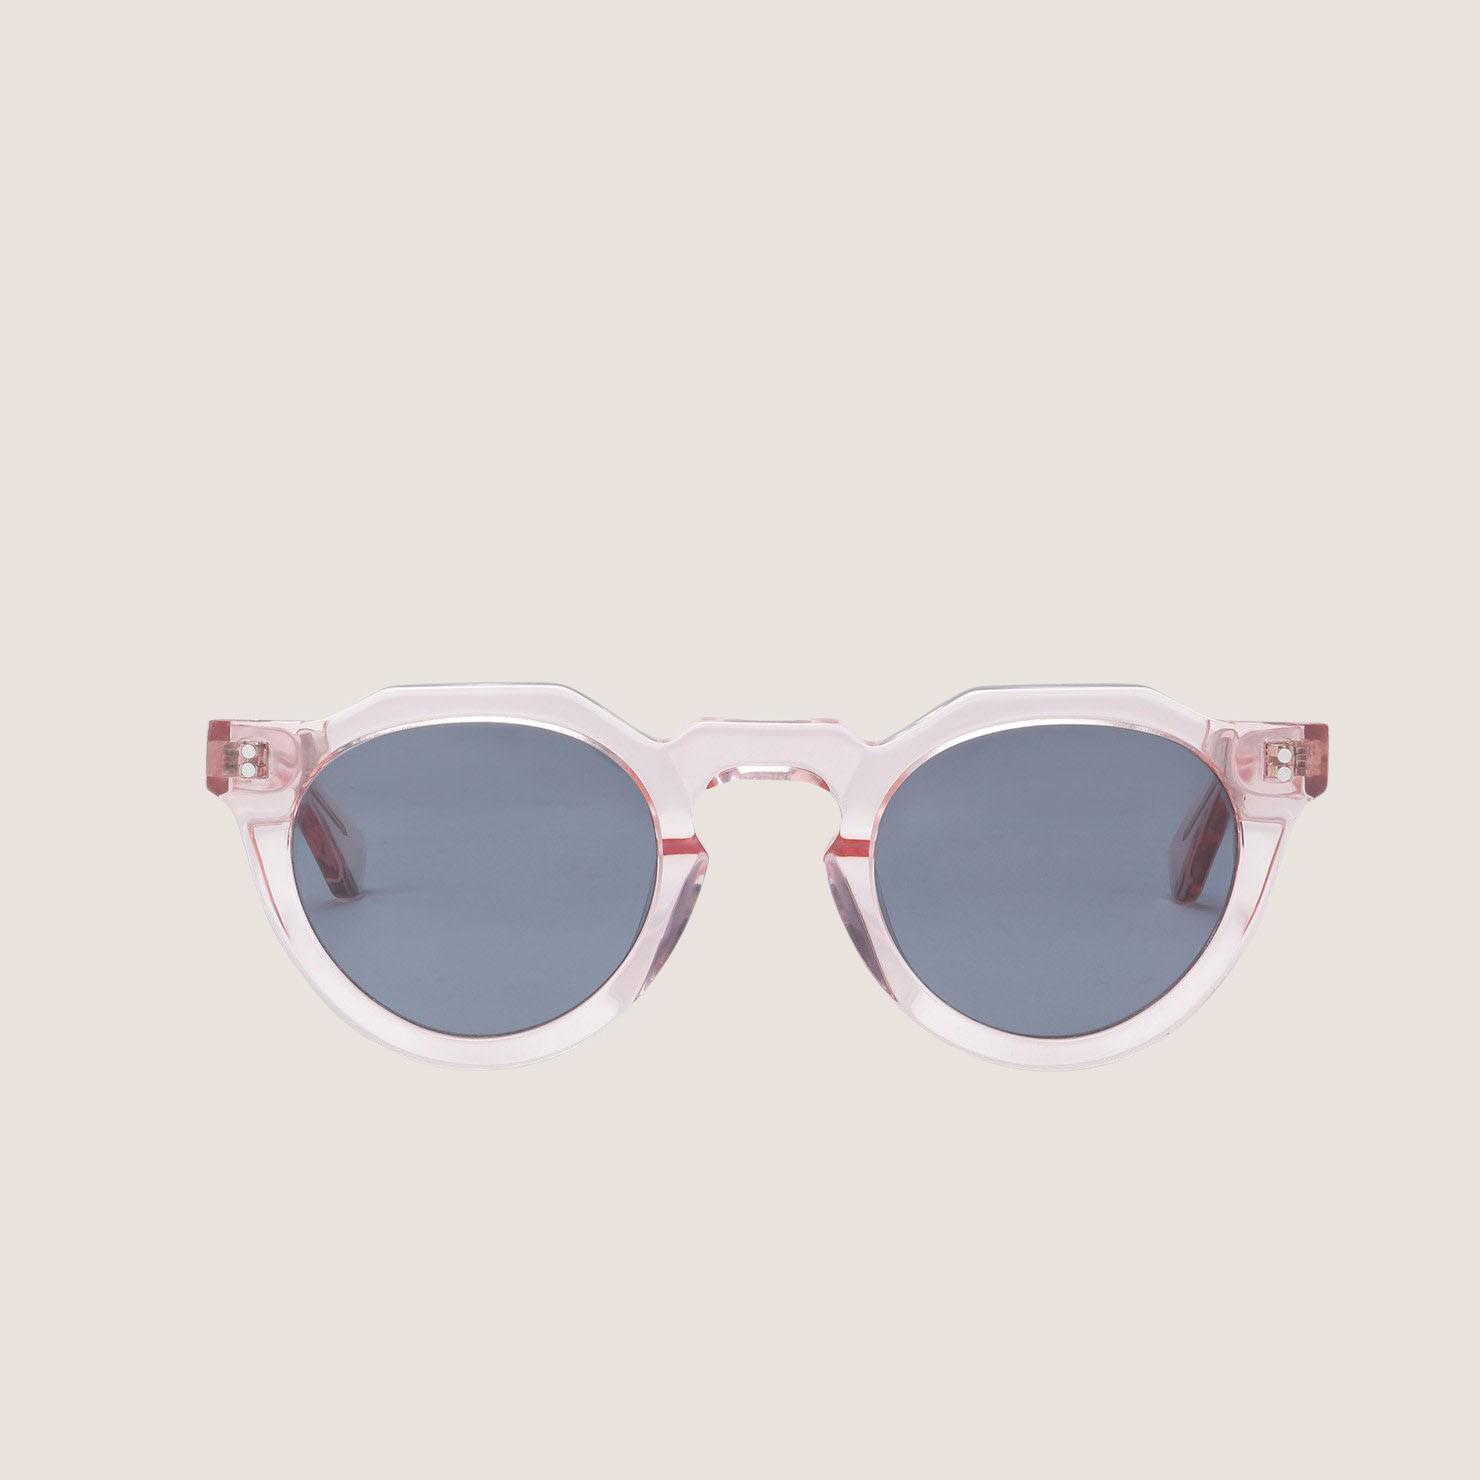 Bretton-Meyer Sunglasses